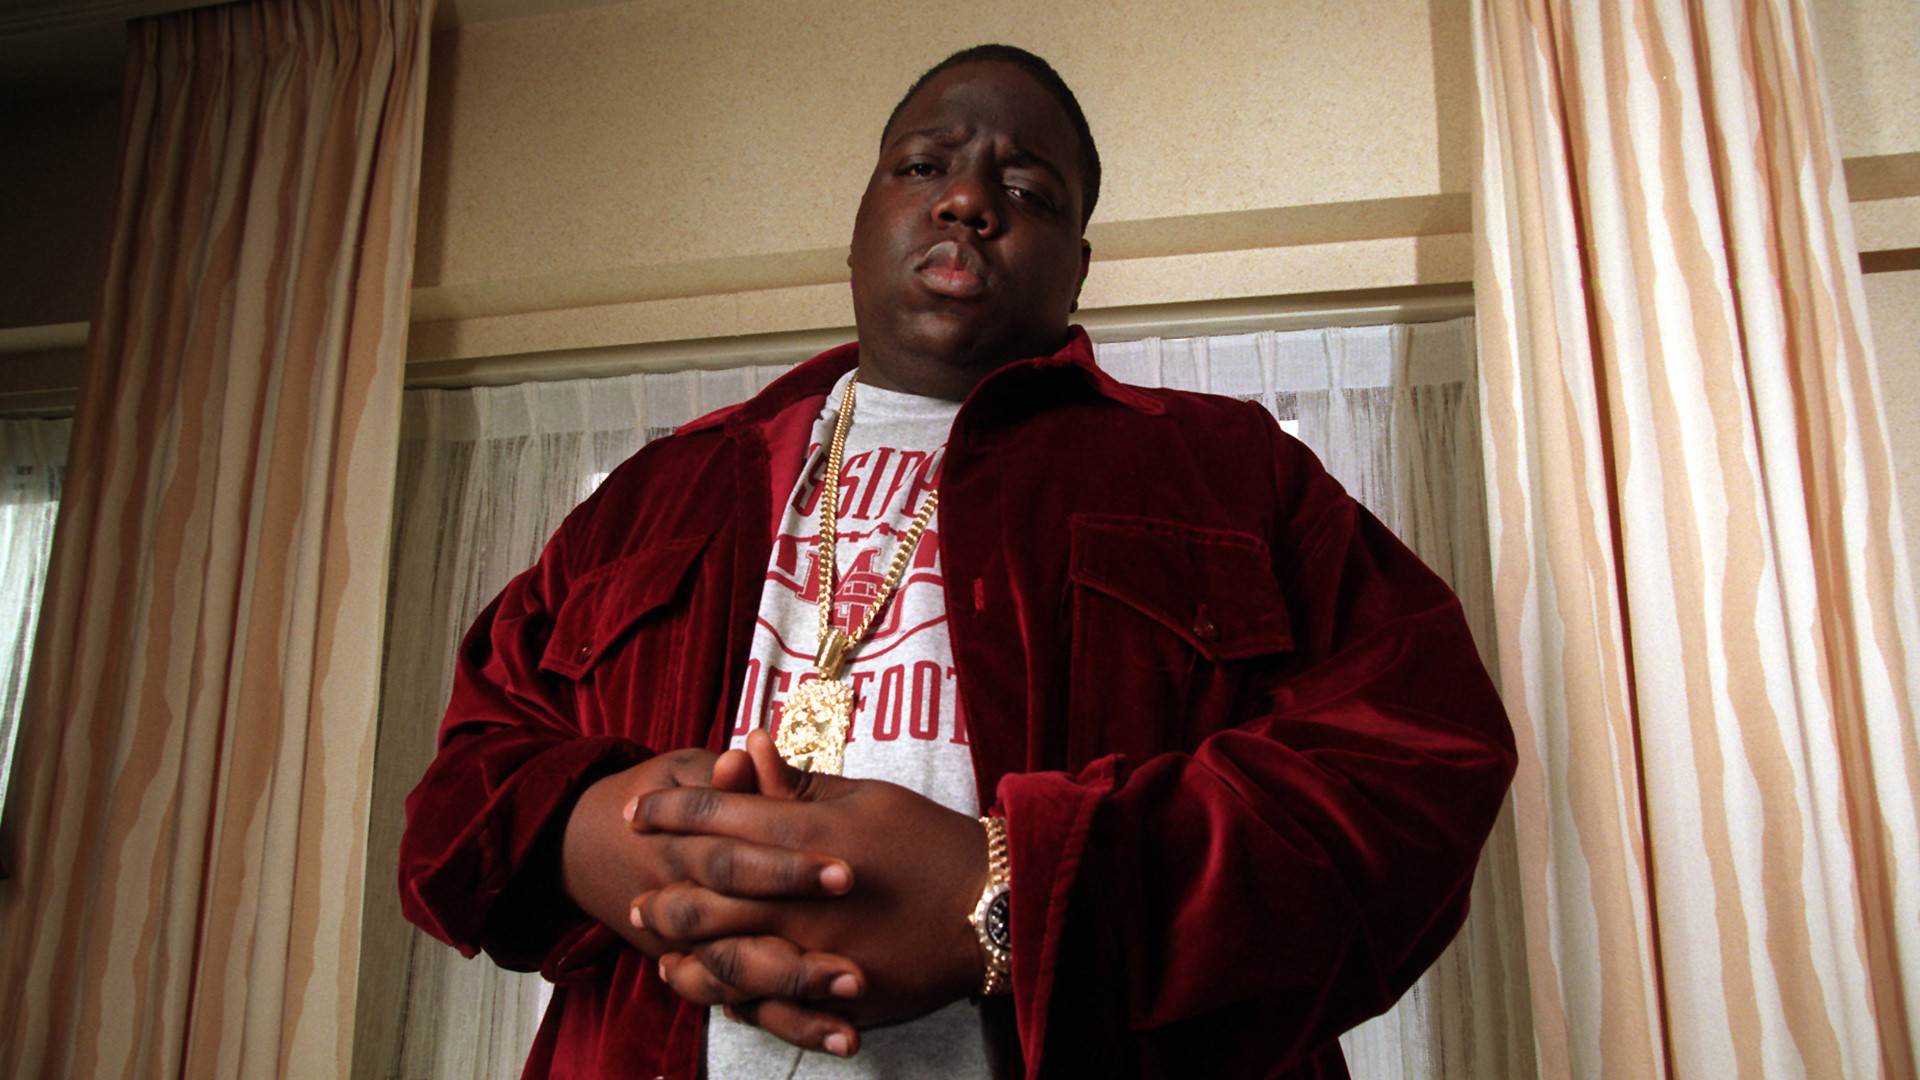 The Notorious B.I.G. backdrop wallpaper